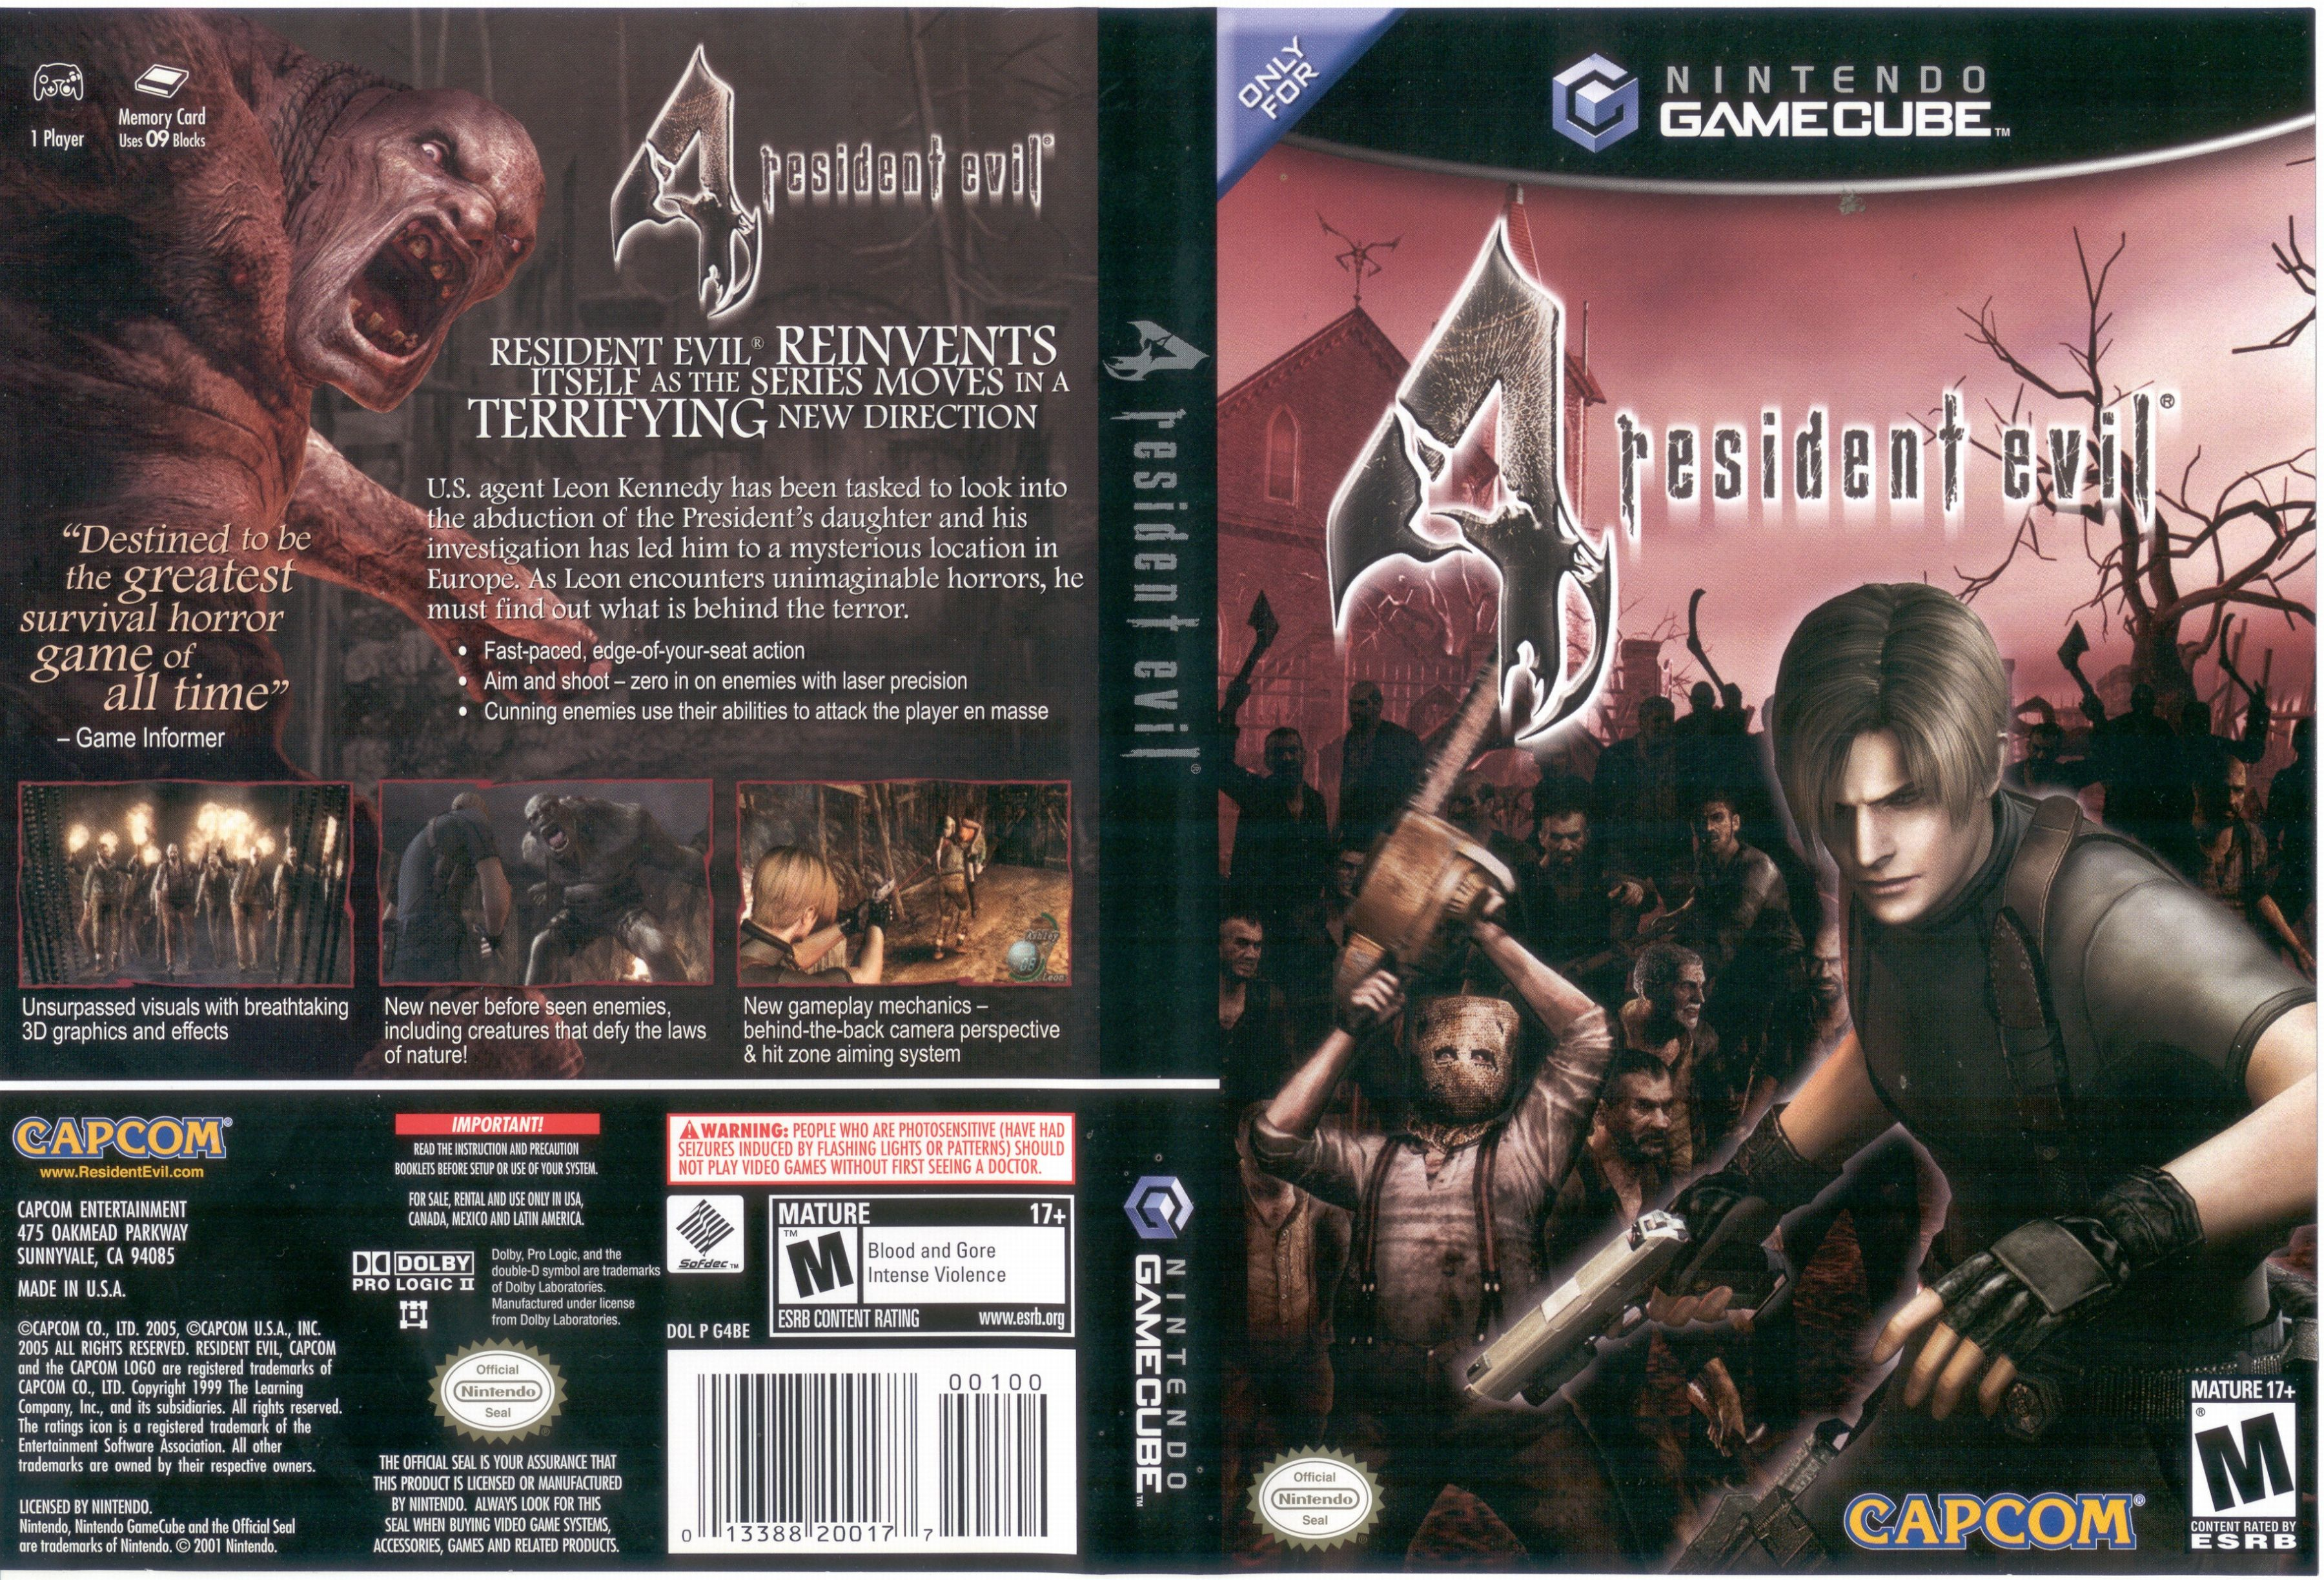 Download Game Resident Evil 4 Pc Full Rip Games - livinvs